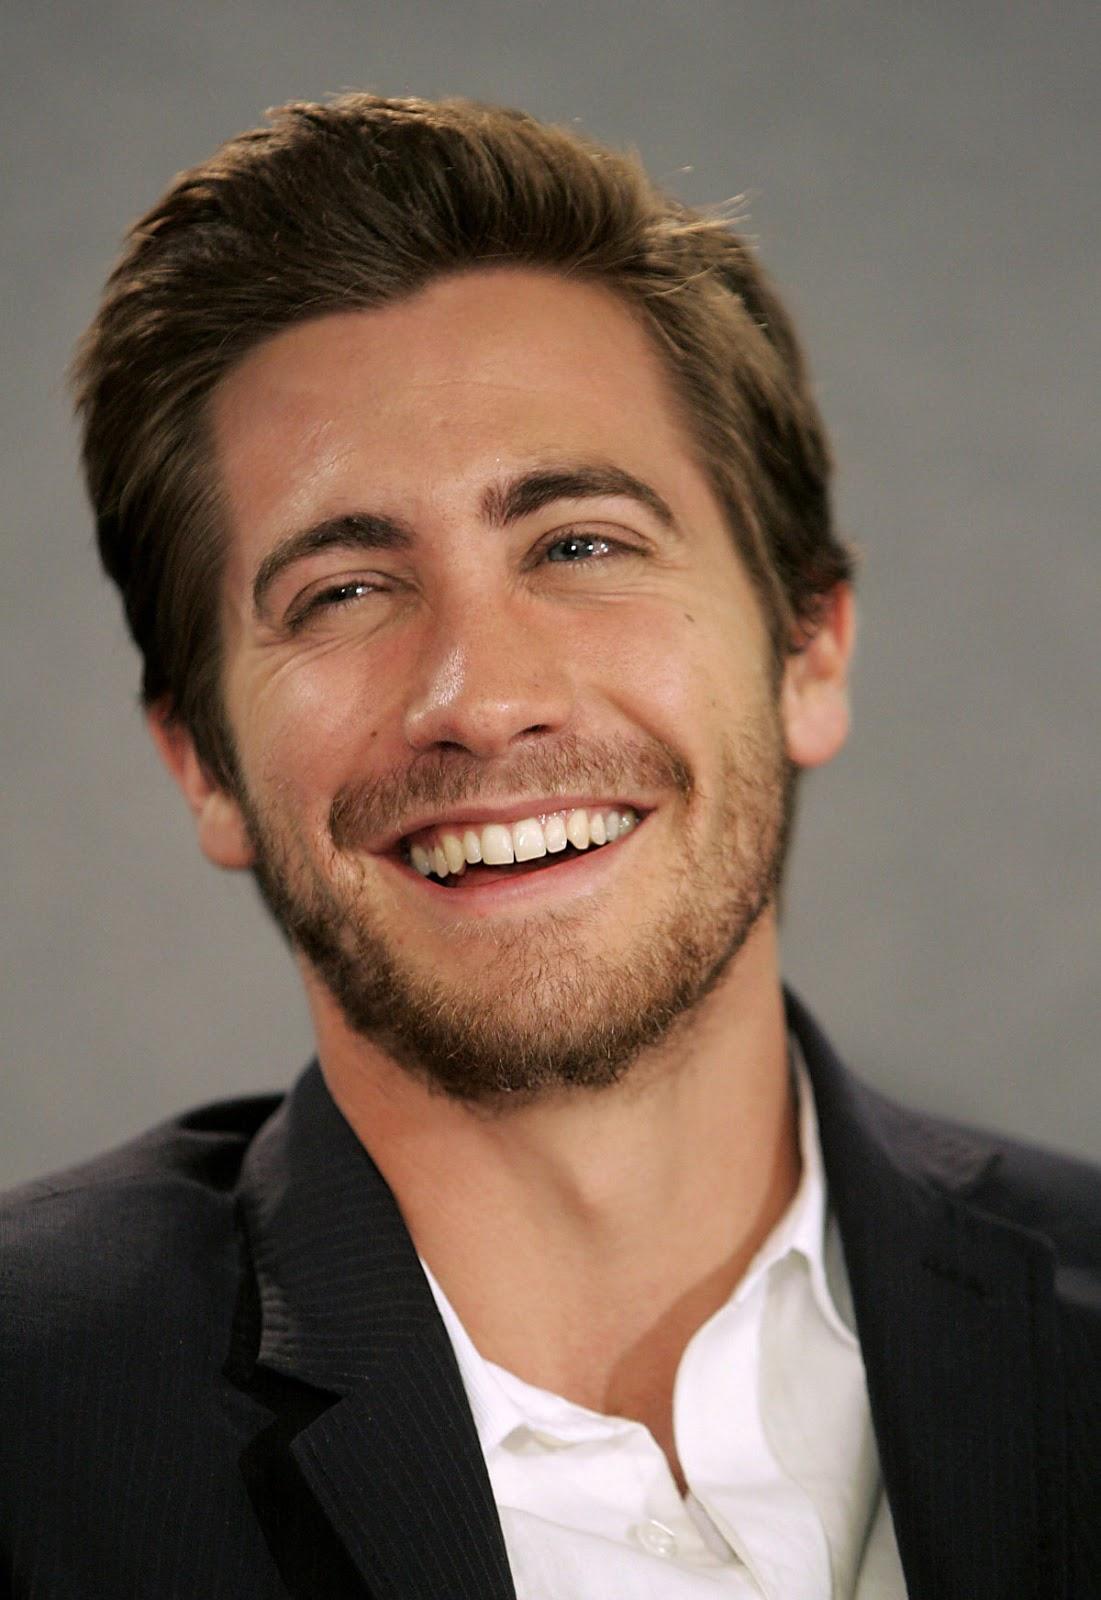 Che sta frequentando Maggie Gyllenhaal